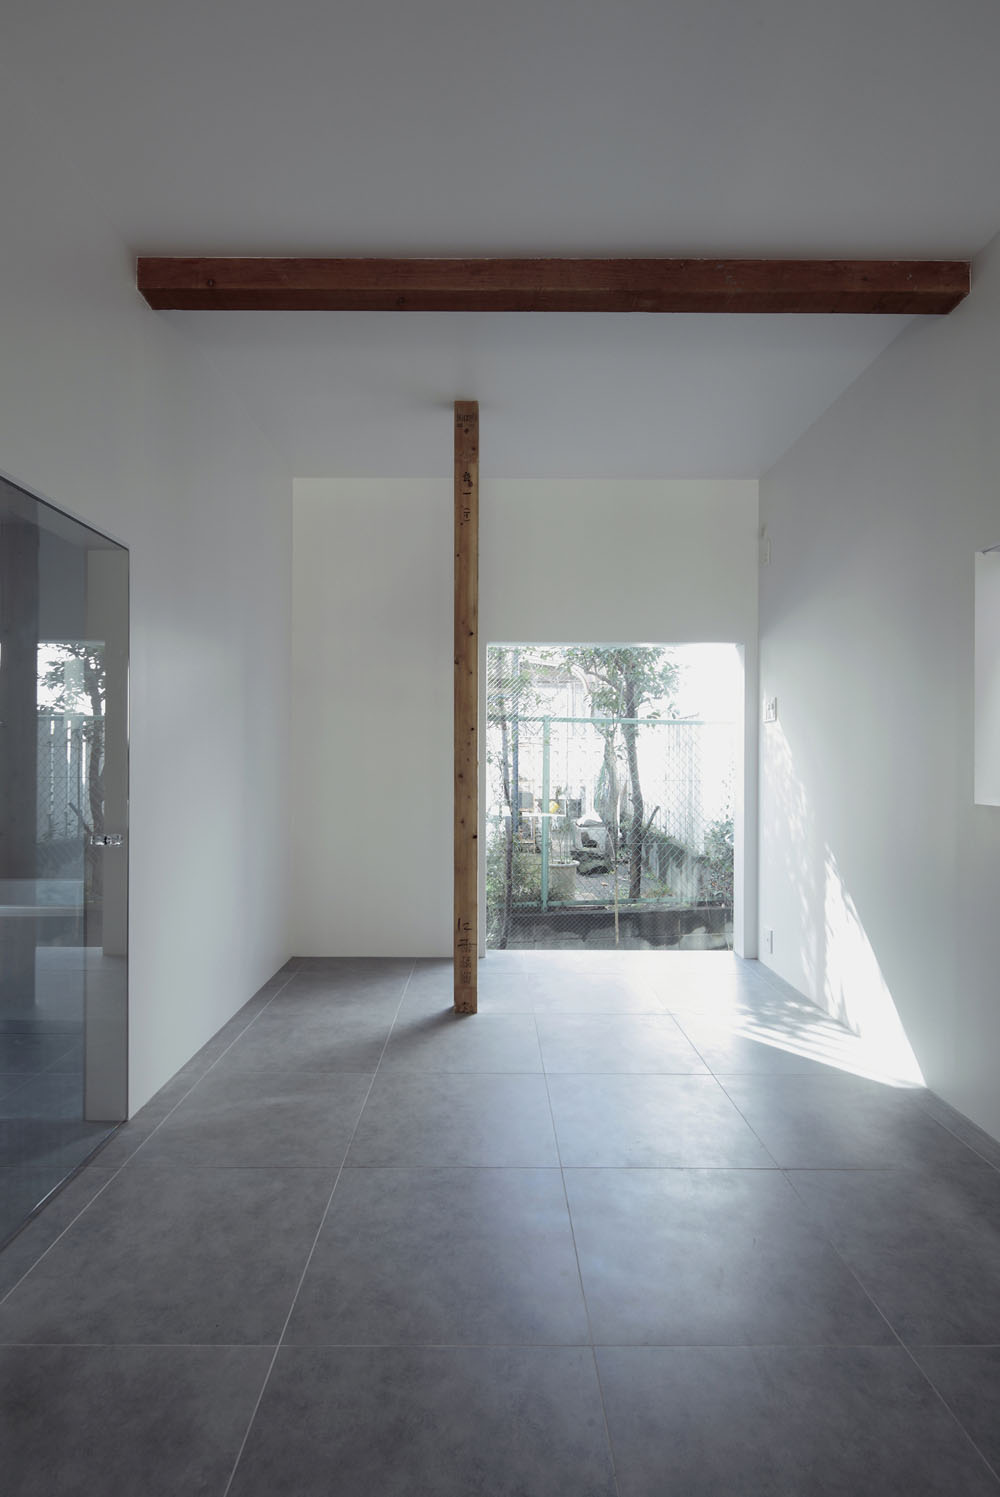 the-tree-mag_hanegi-g-house-by-makoto-yamaguchi-design_60s.jpg